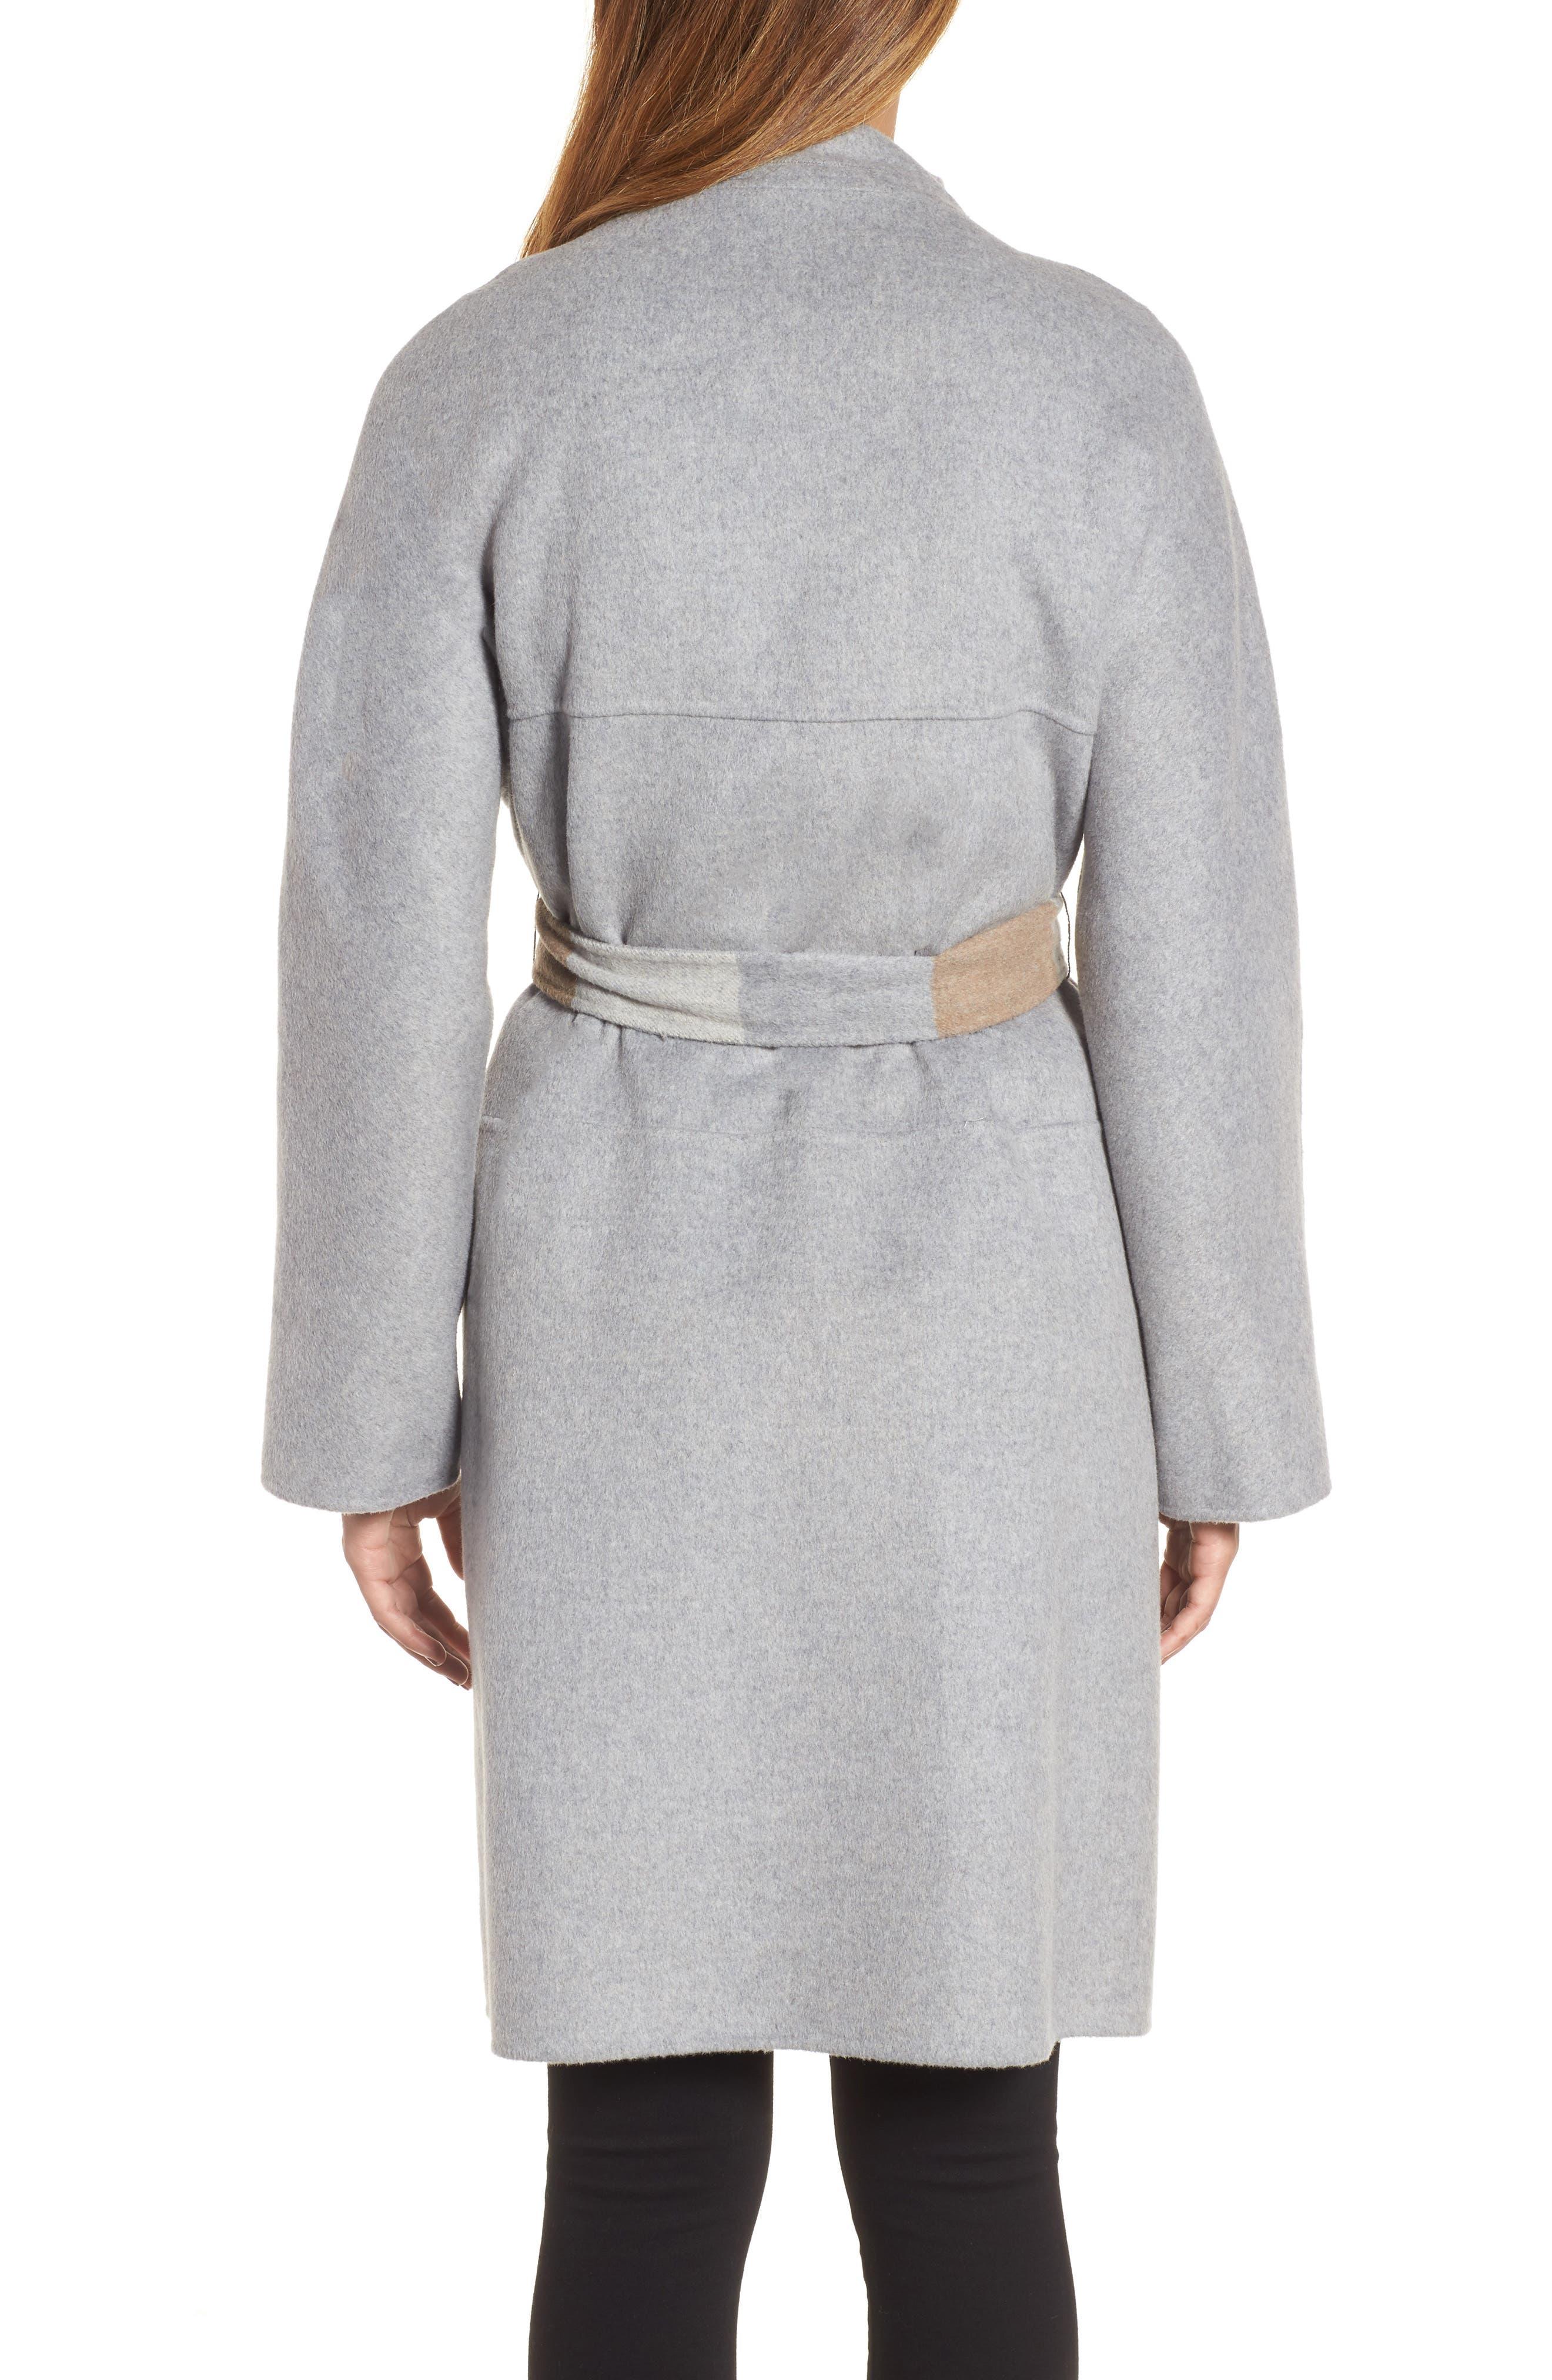 DKNY Wool Blend Wrap Coat,                             Alternate thumbnail 2, color,